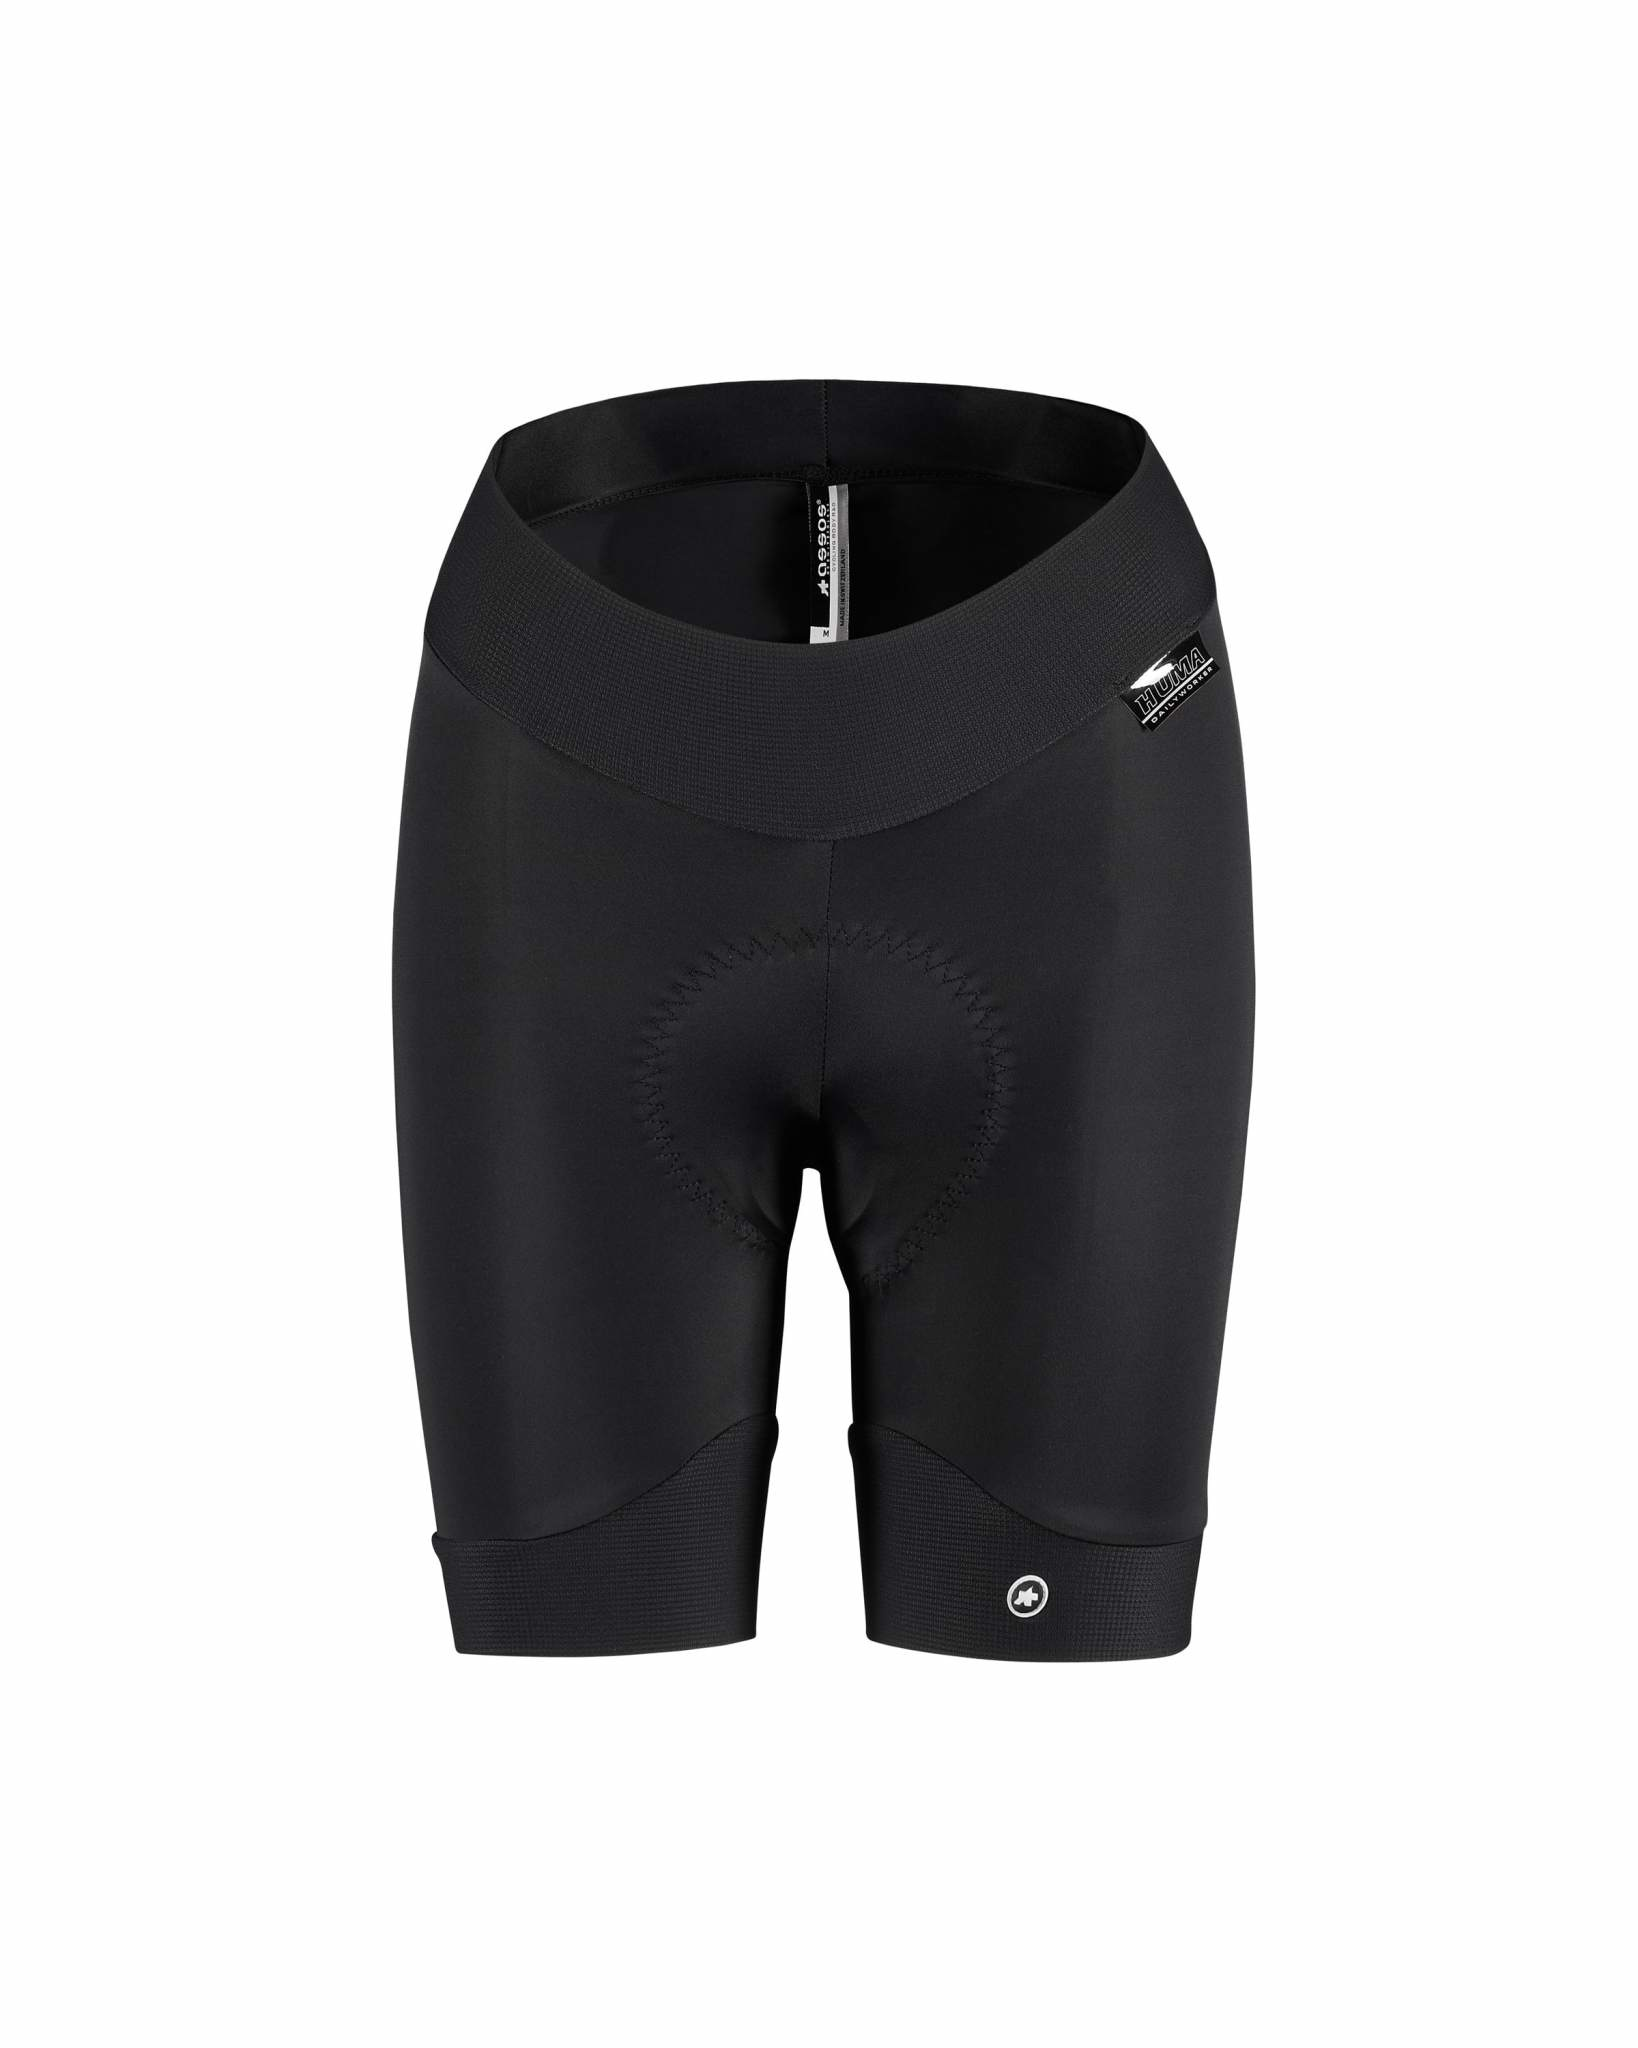 Assos Assos UMA GT Half Shorts Women's